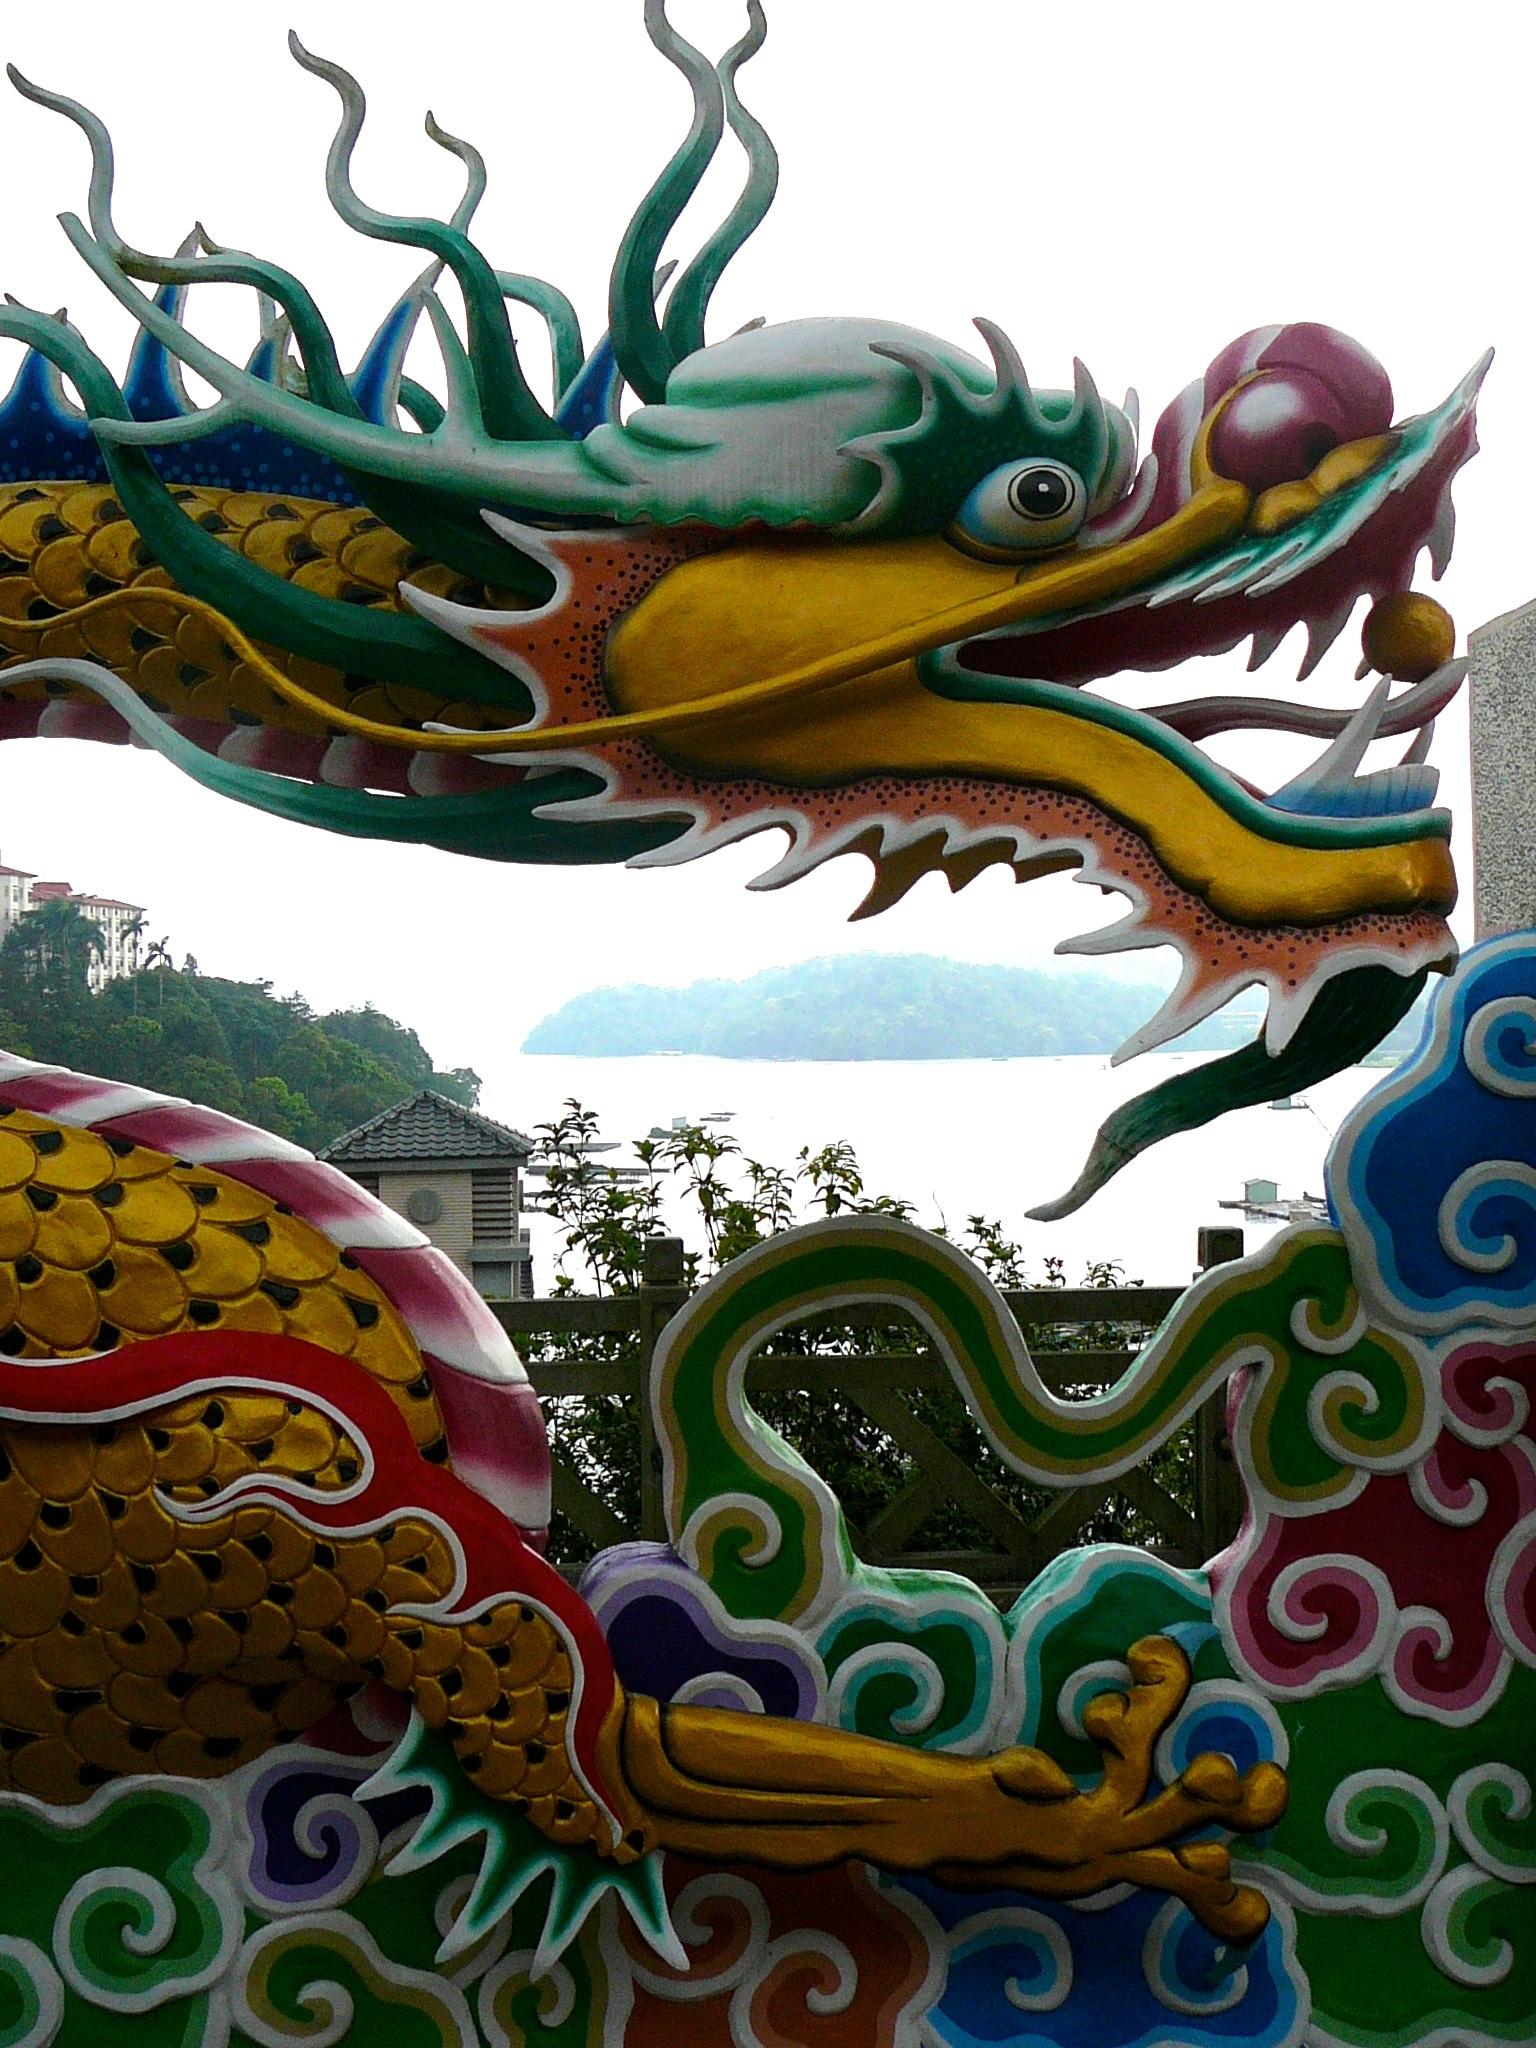 Gambar Arsitektur Asia Dekorasi Cina Simbol Agama Budha